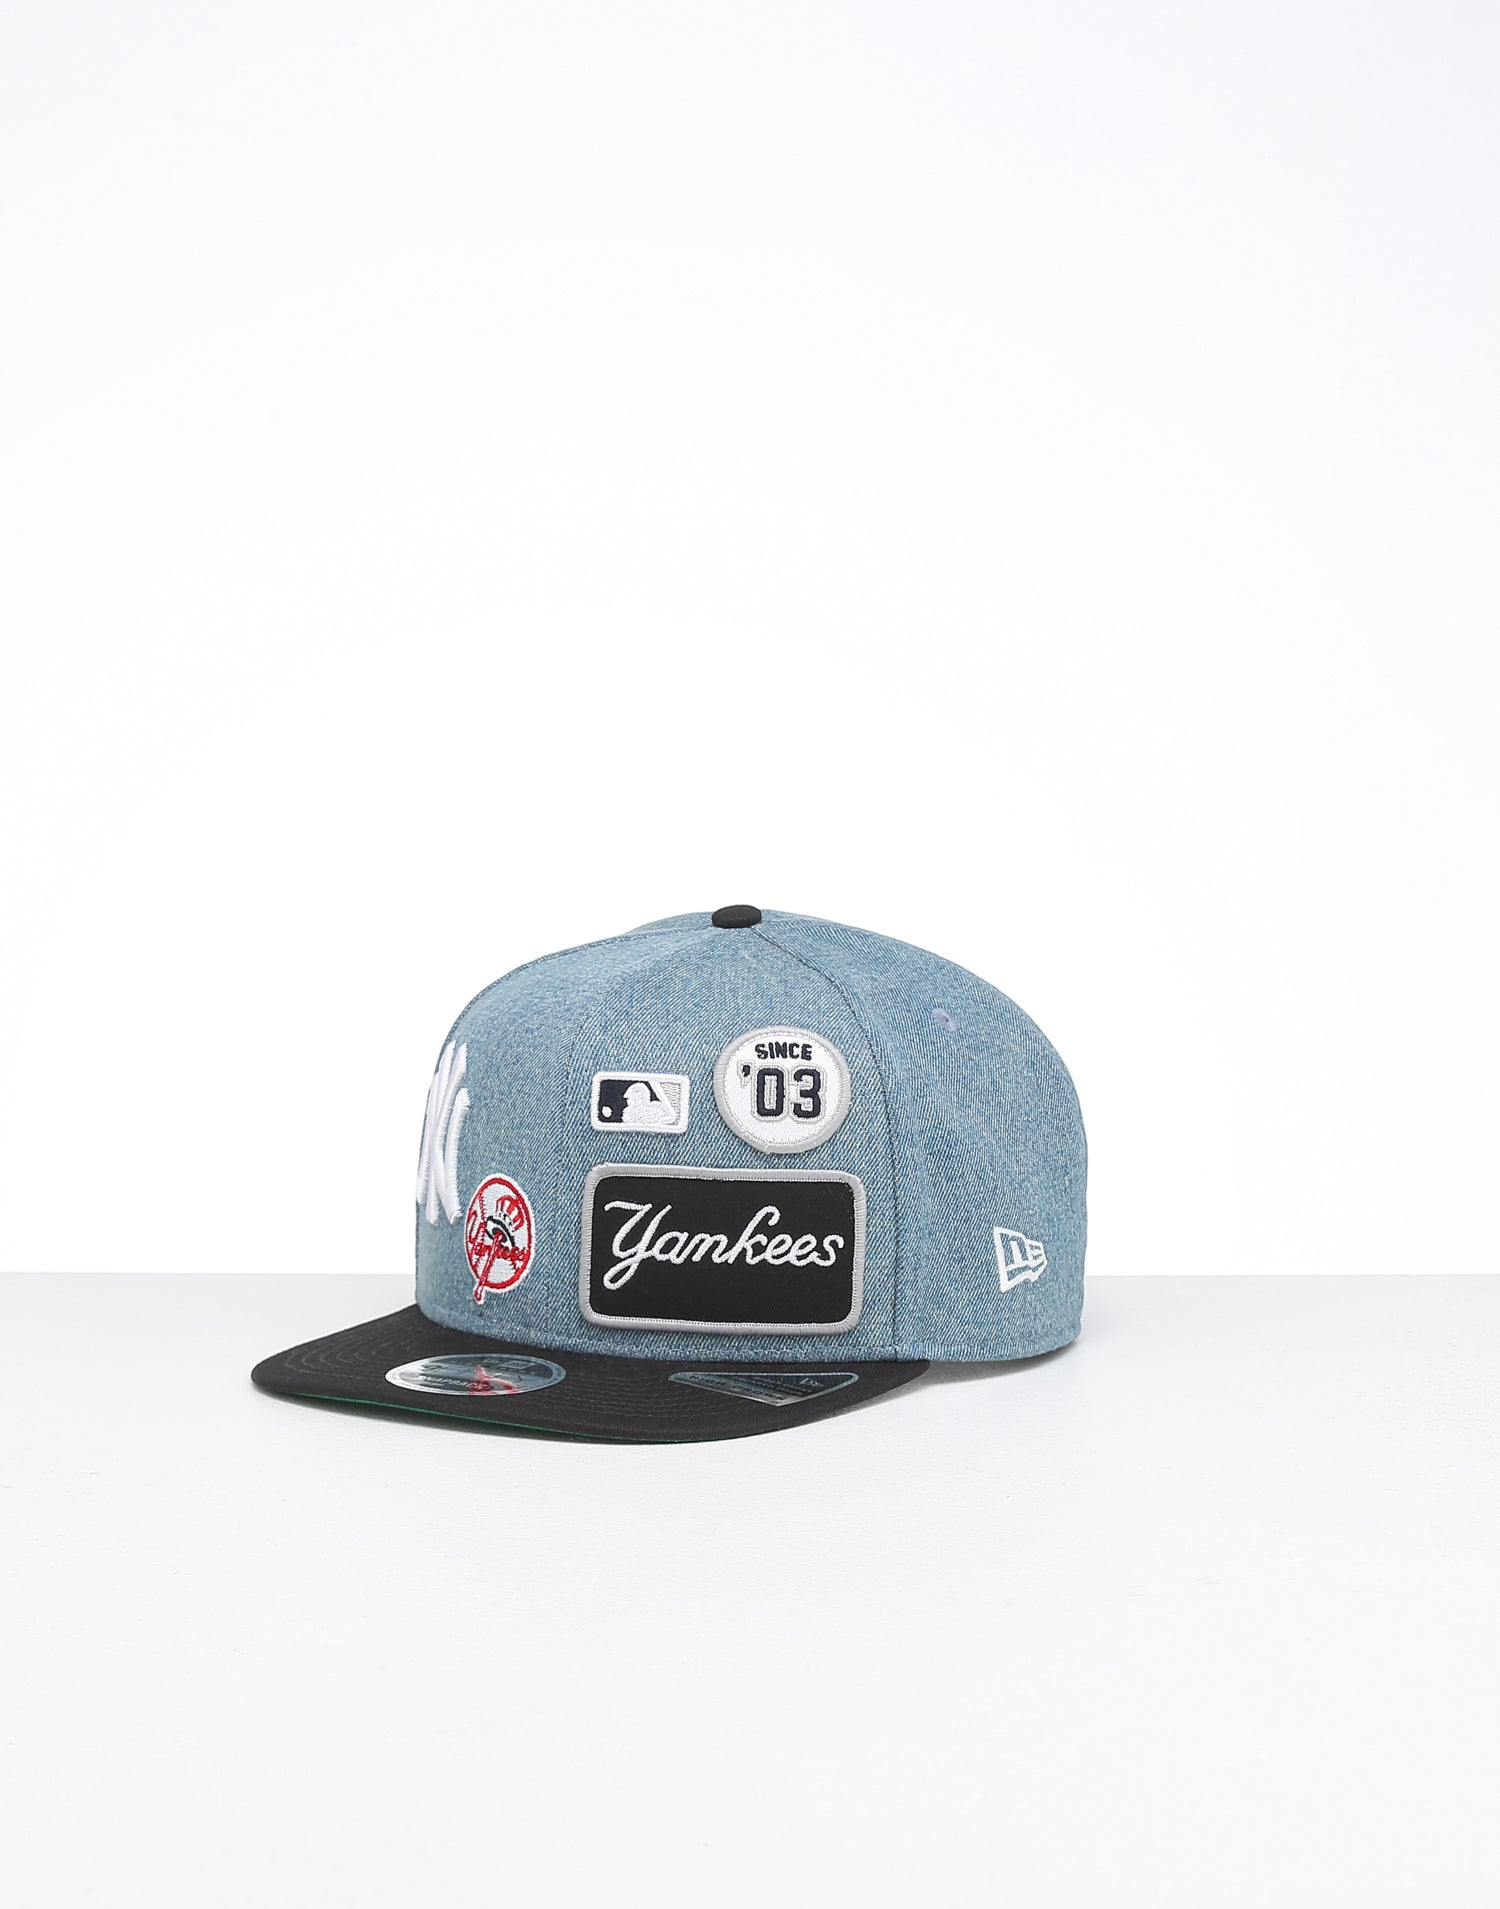 New Era MLB New York Yankees Badged Fan Retro Snapback Adjustable Hat W